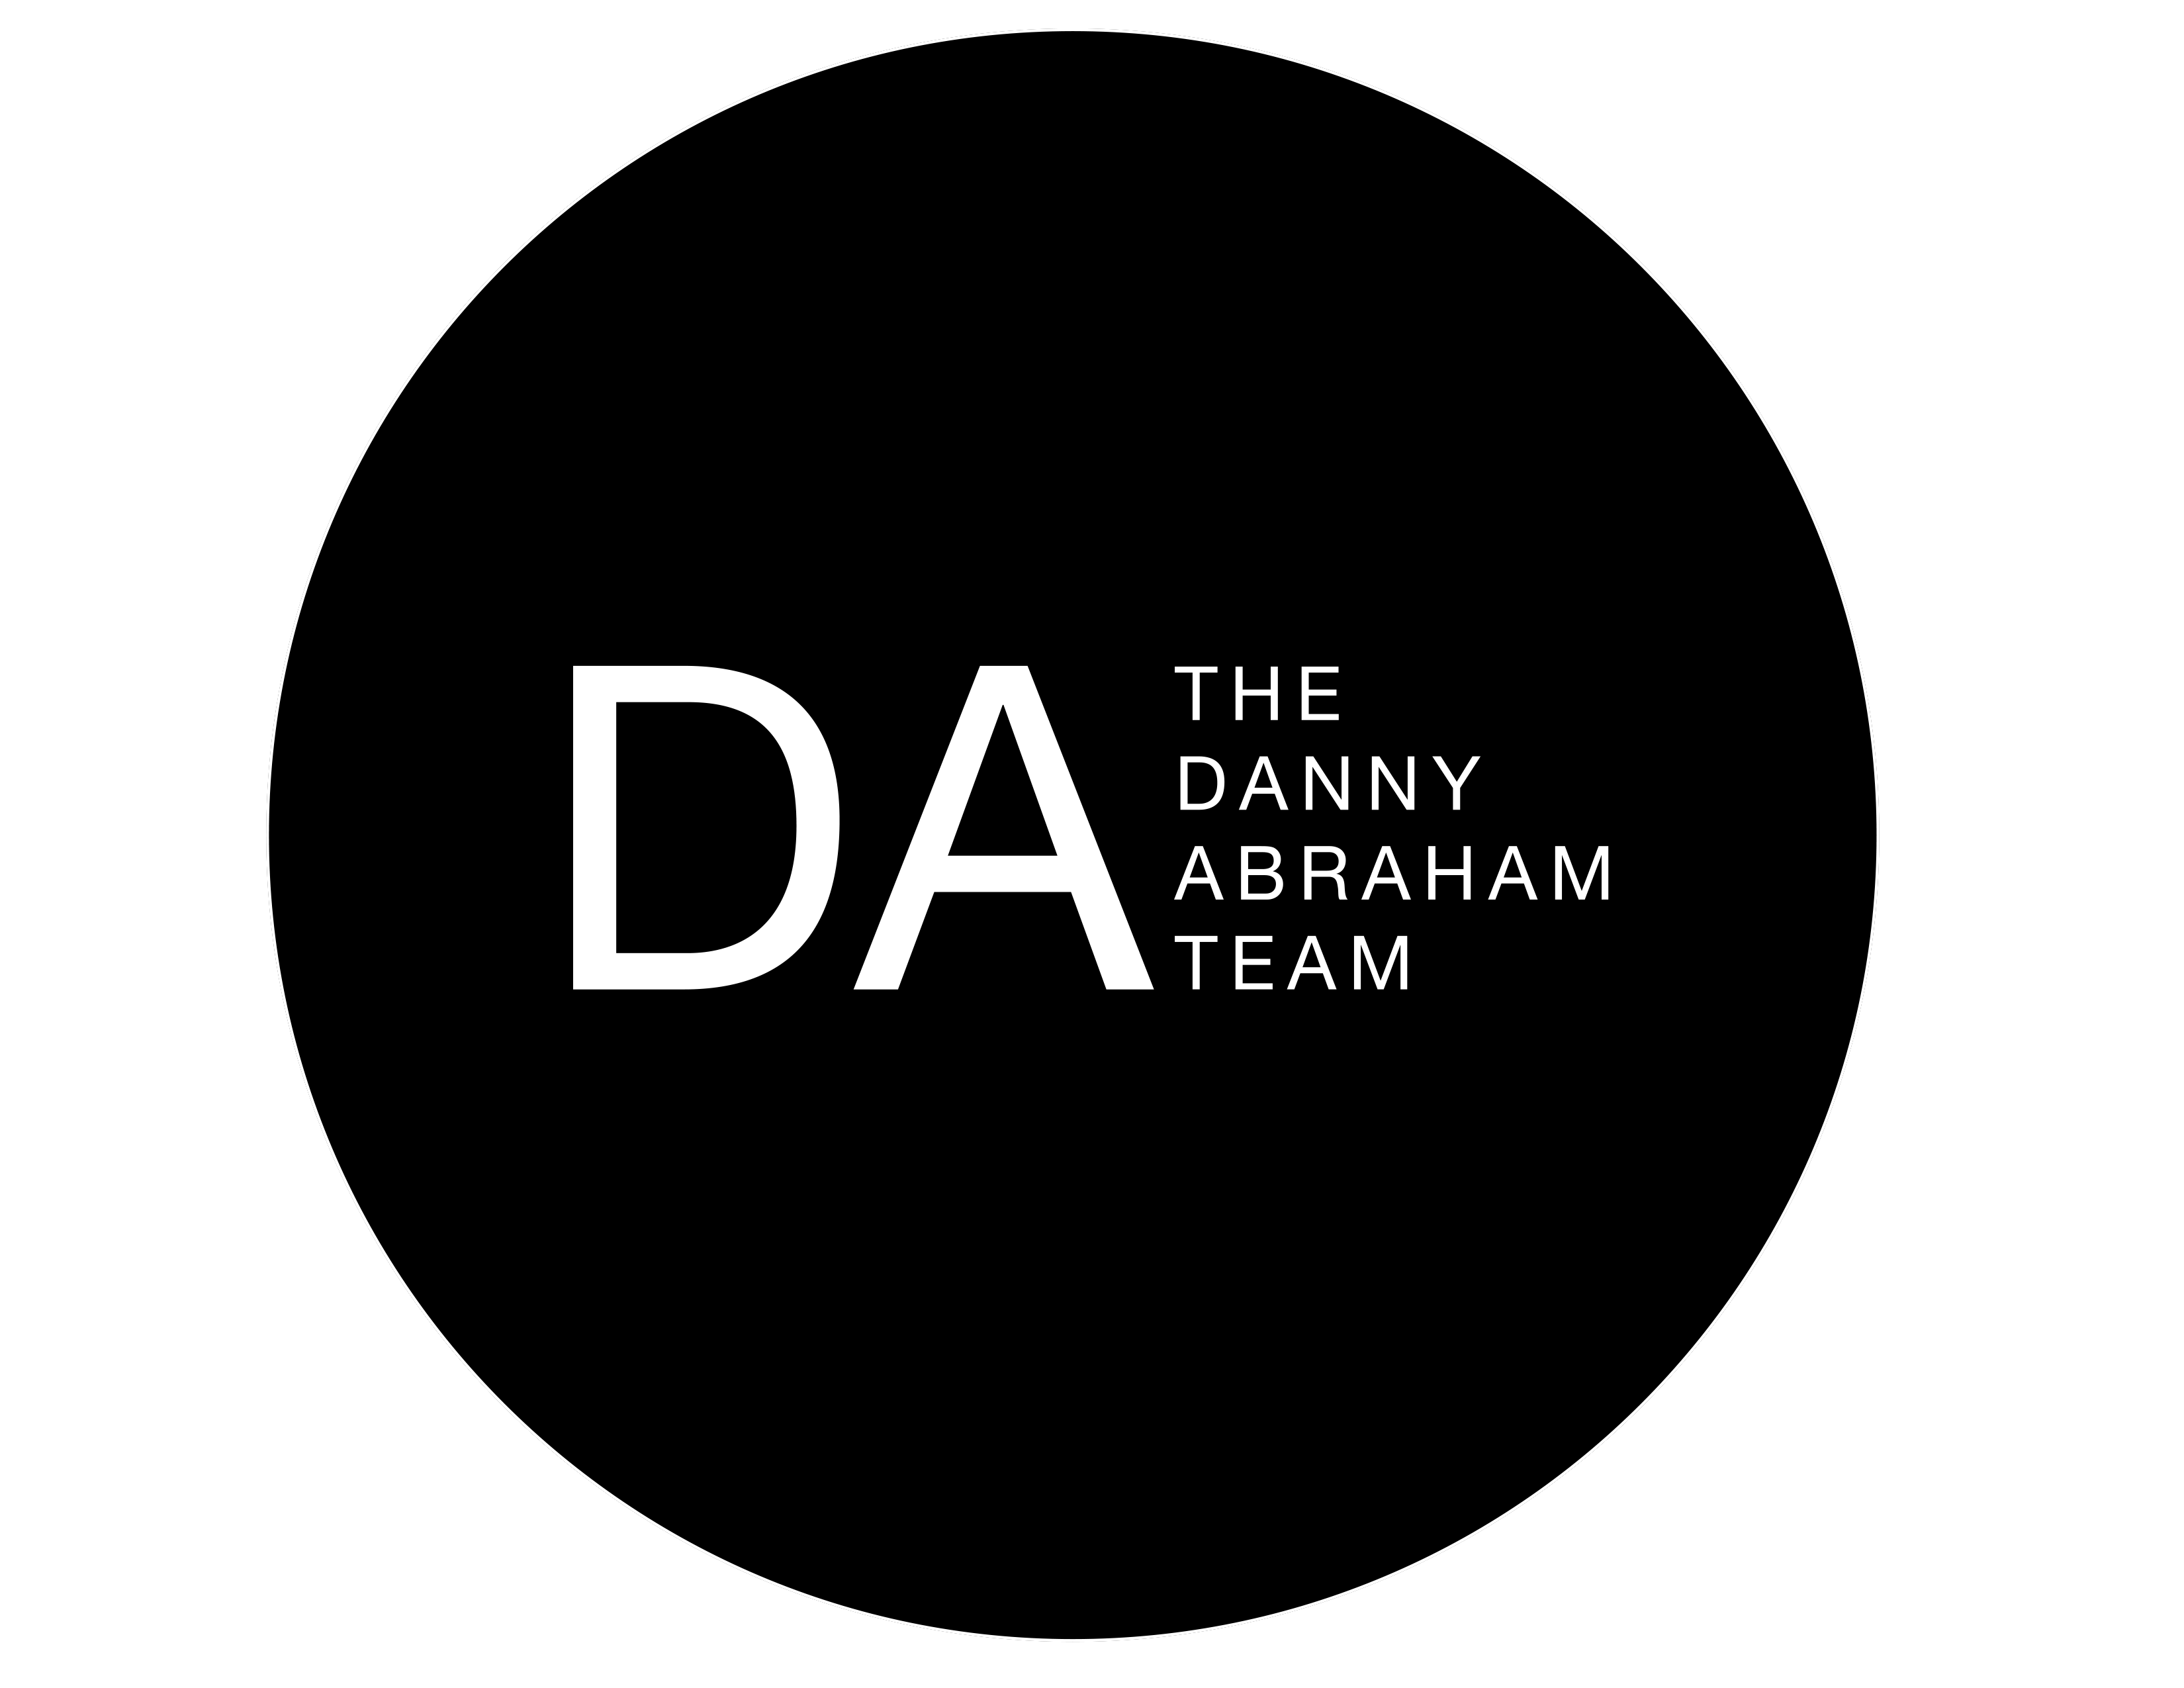 The Danny Abraham Team